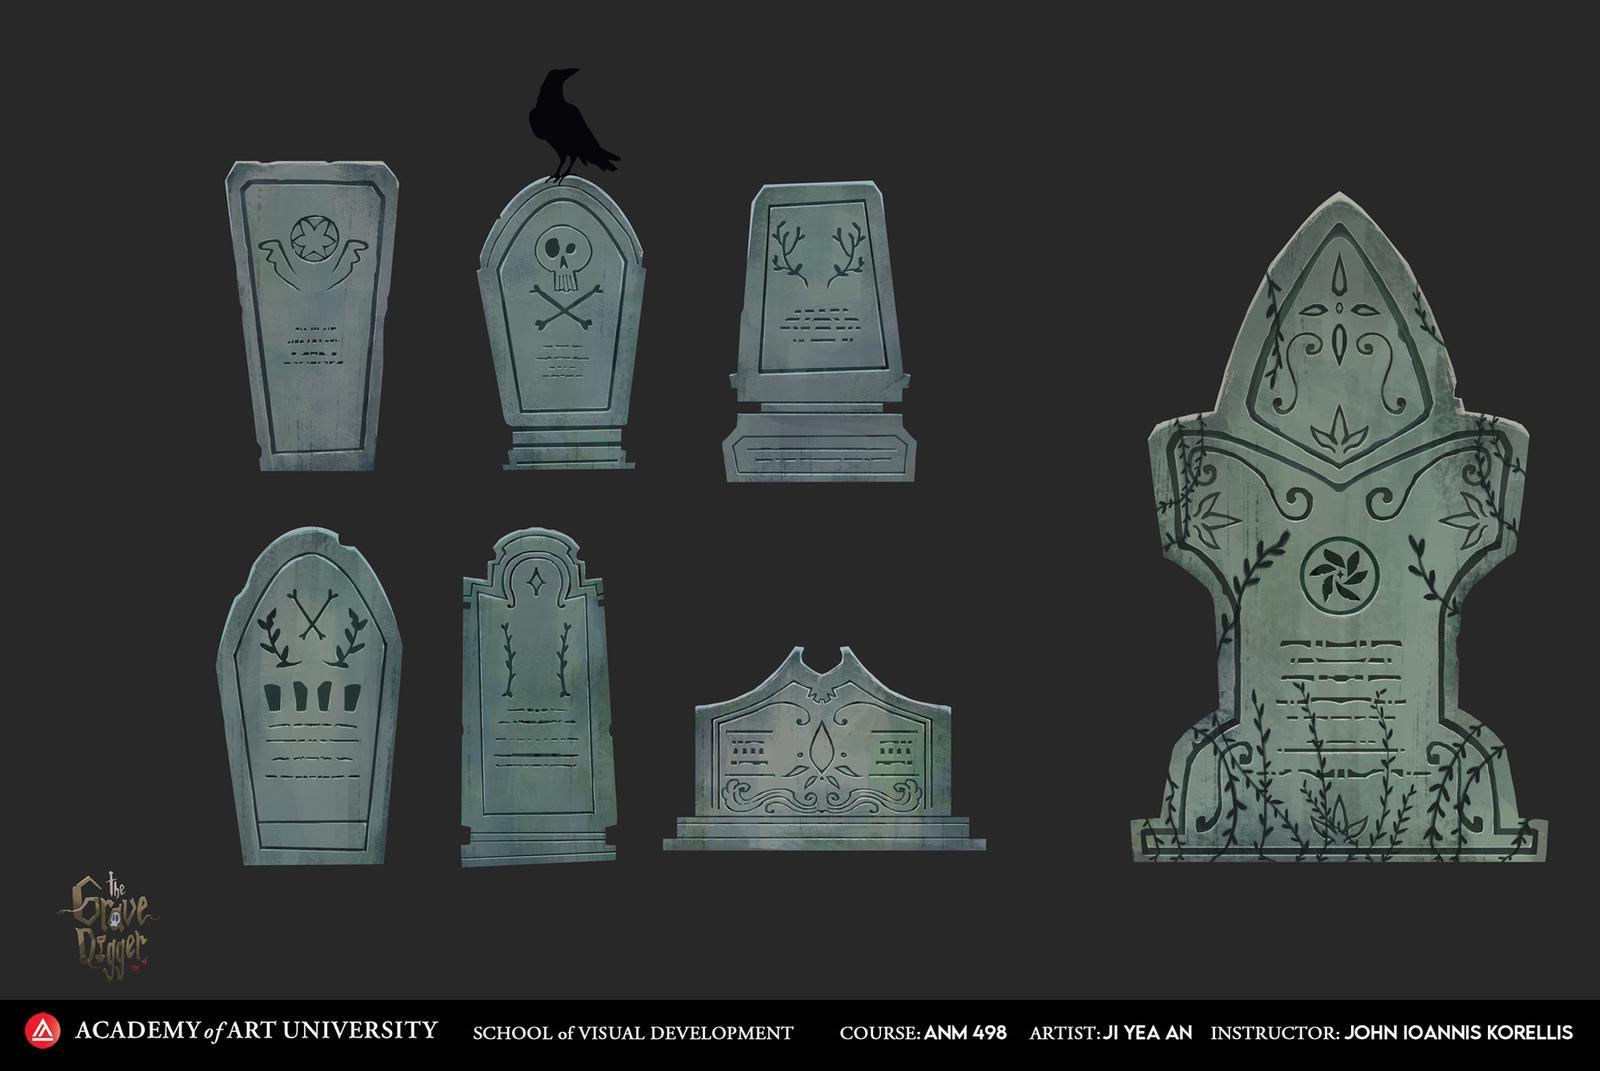 The Grave Digger: Tombstones - Ji Yea An